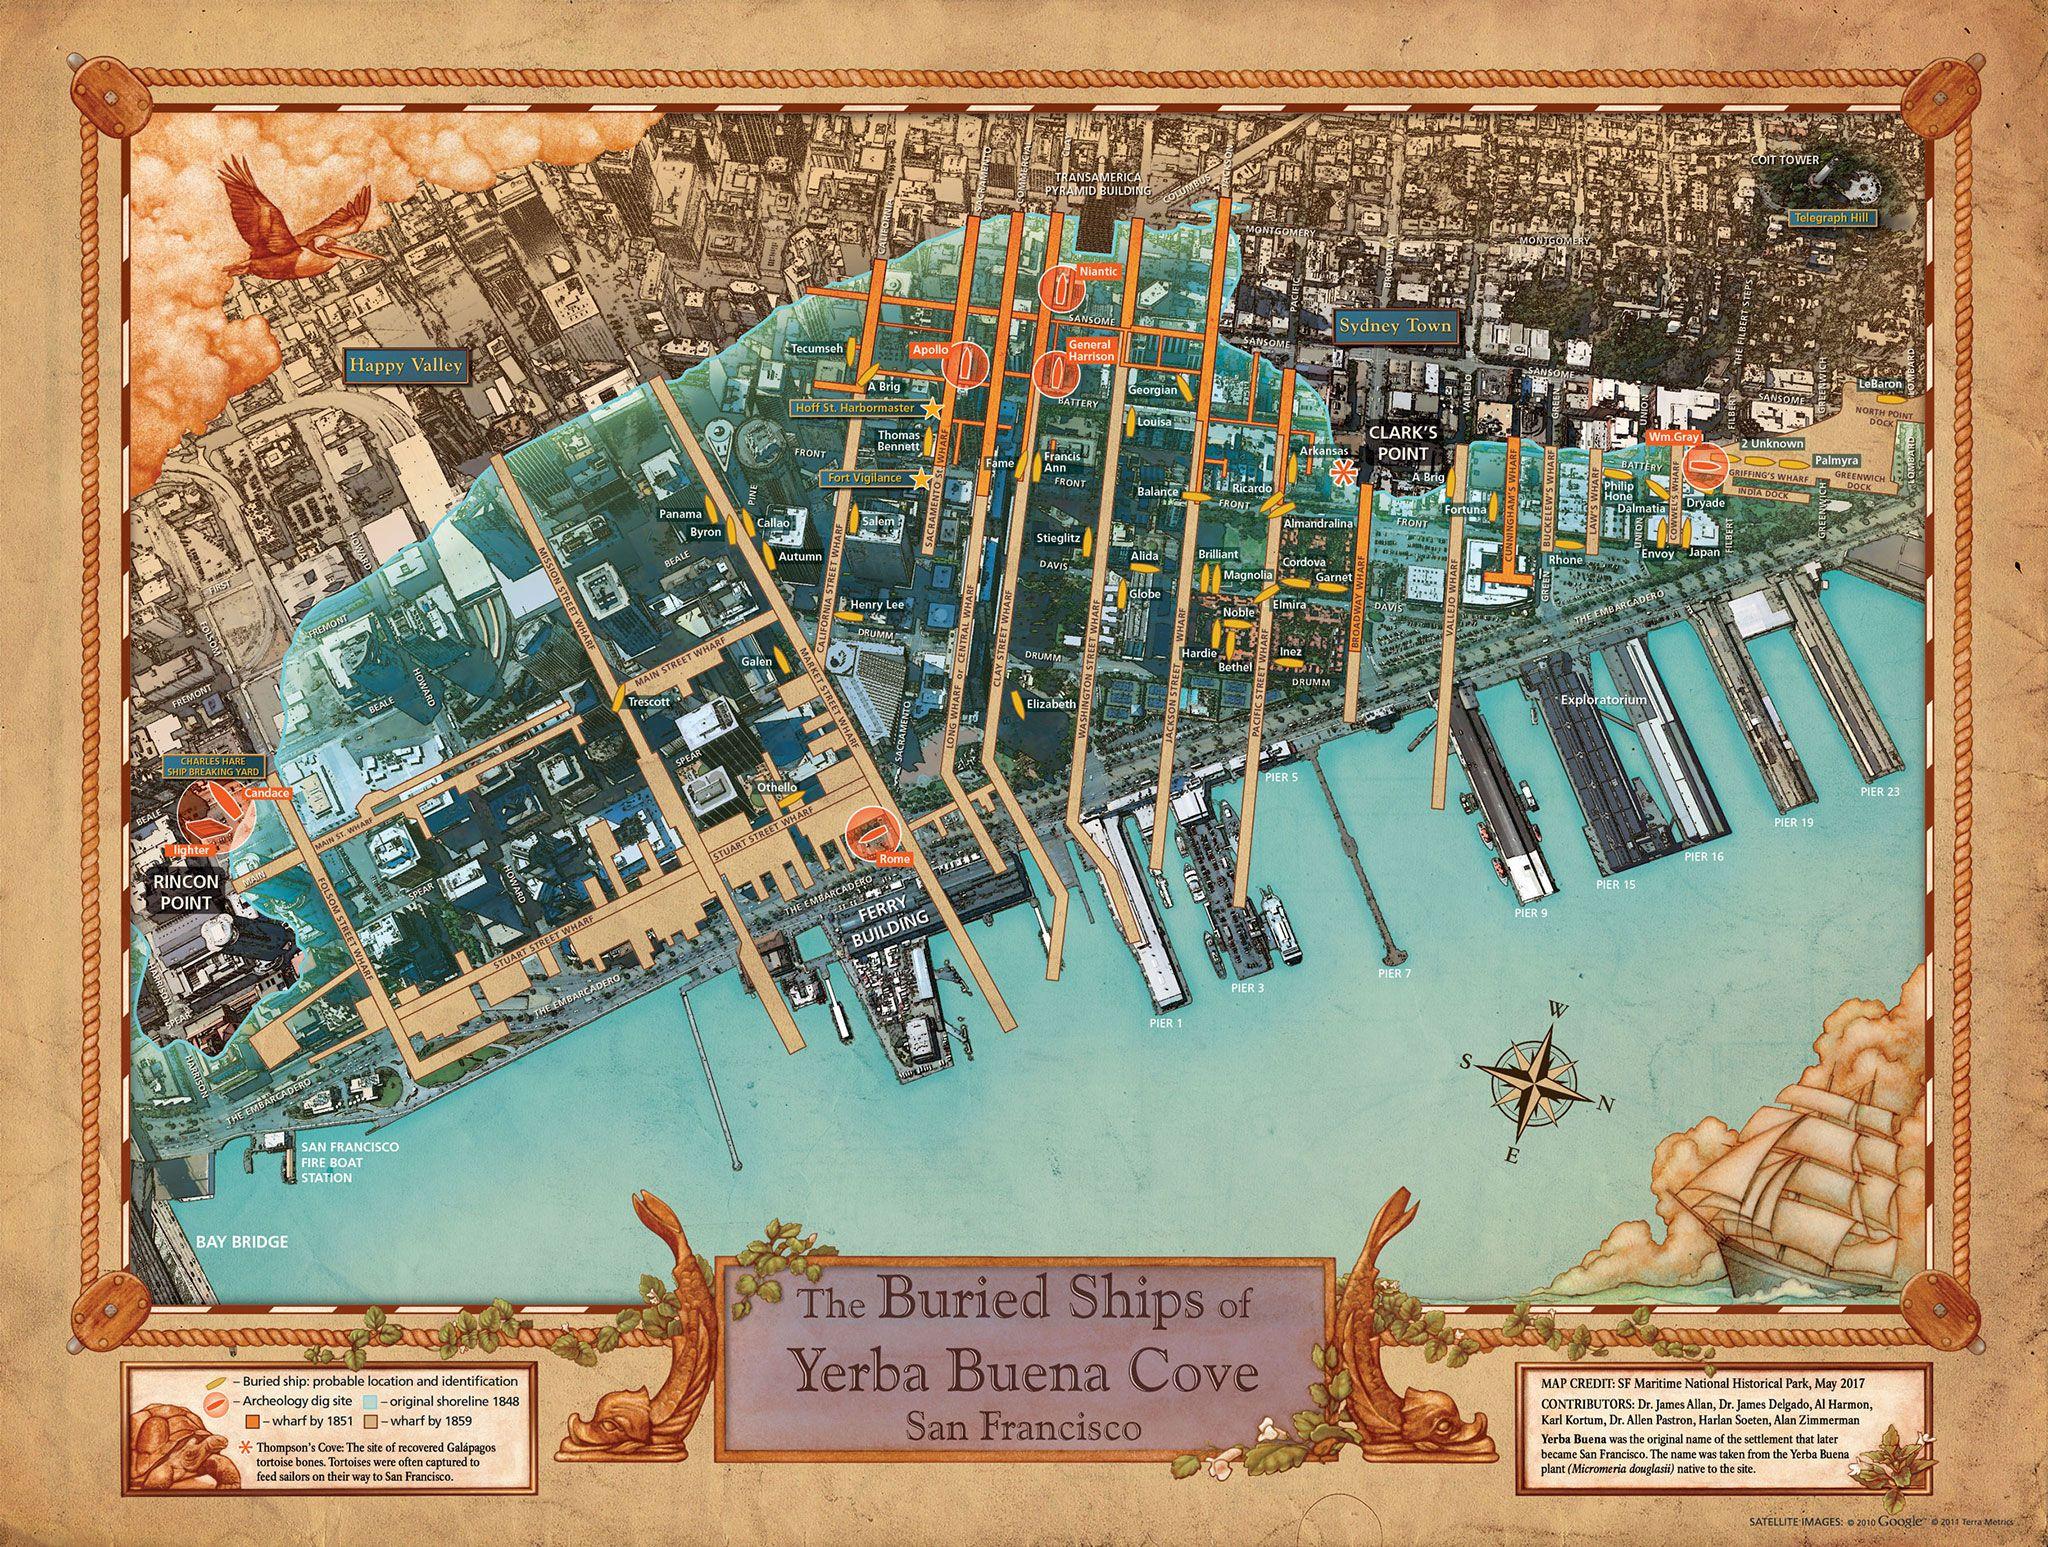 New Map Reveals Ships Buried Below San Francisco Bury San